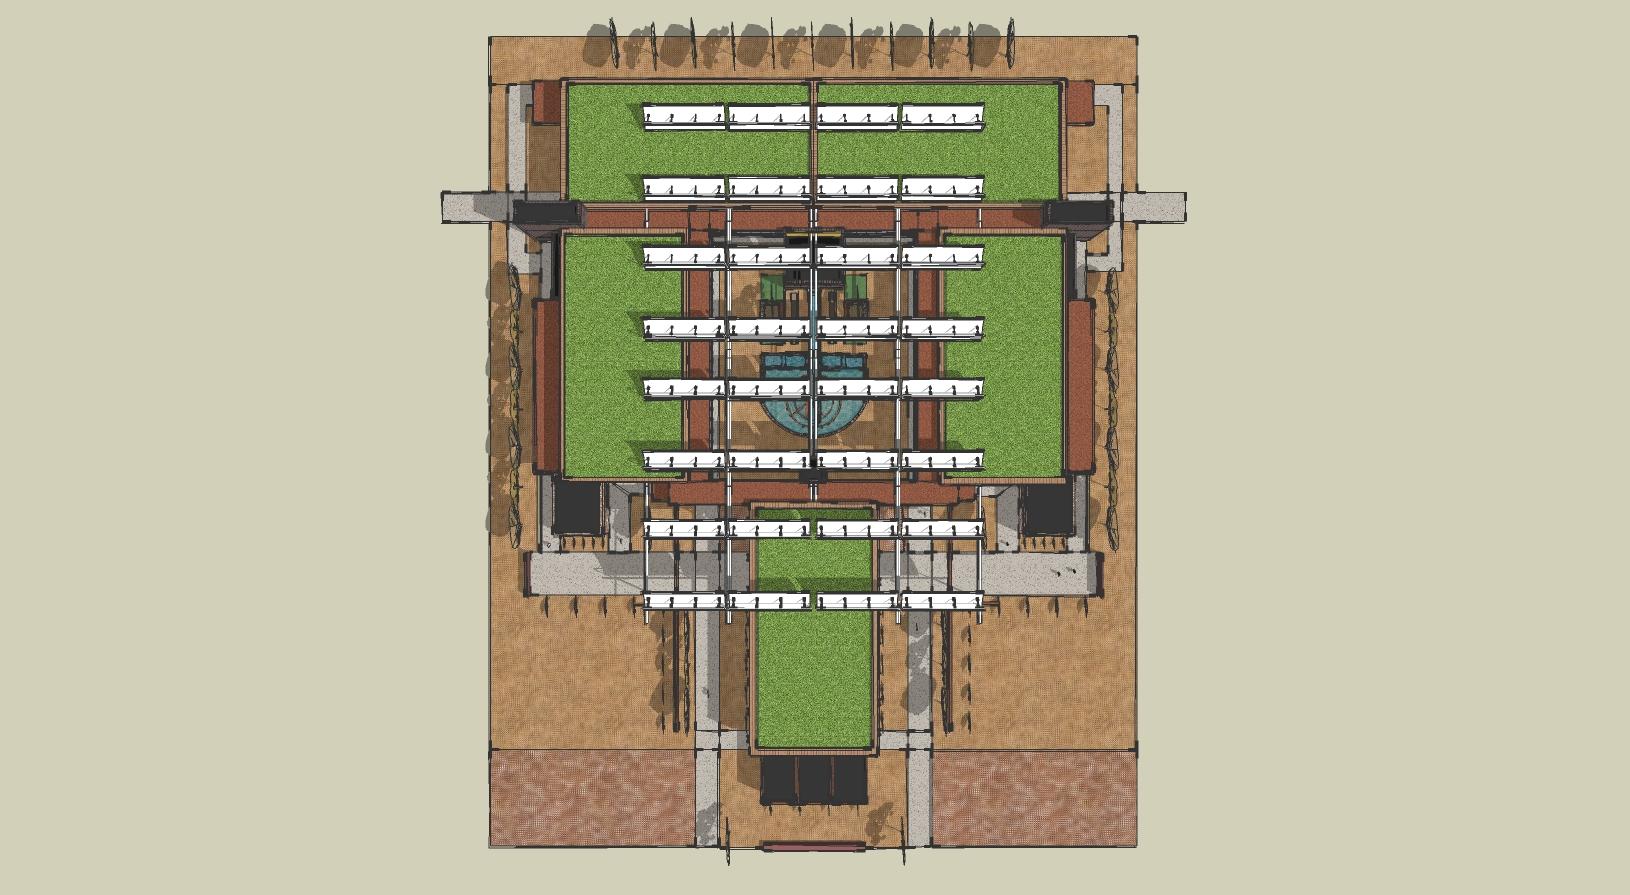 Roof Plan - Birdseye